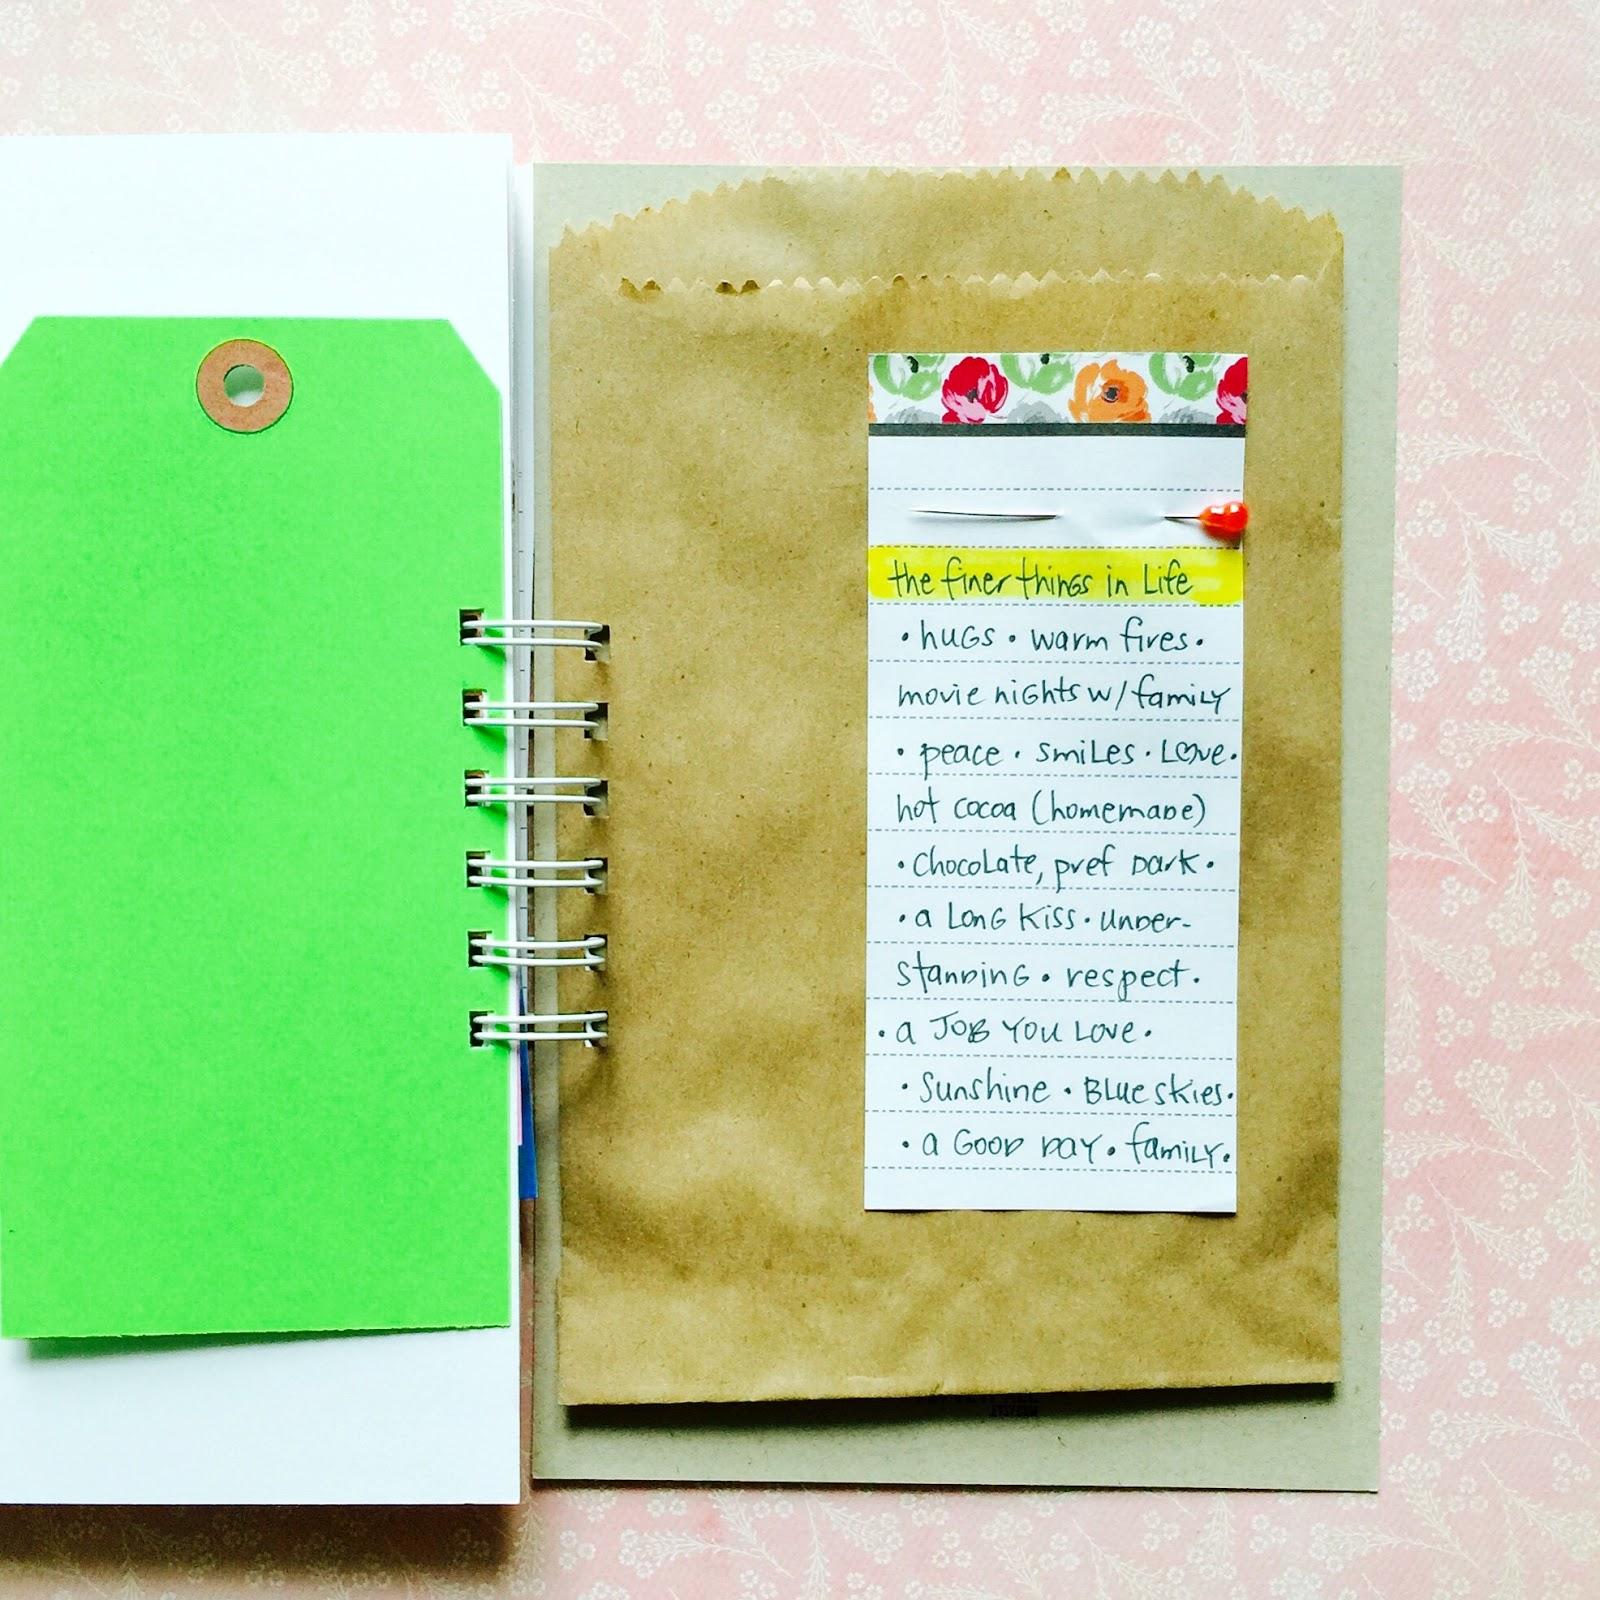 #scrapbook #lists #listersgottalist #mini album #mini #book #challenge